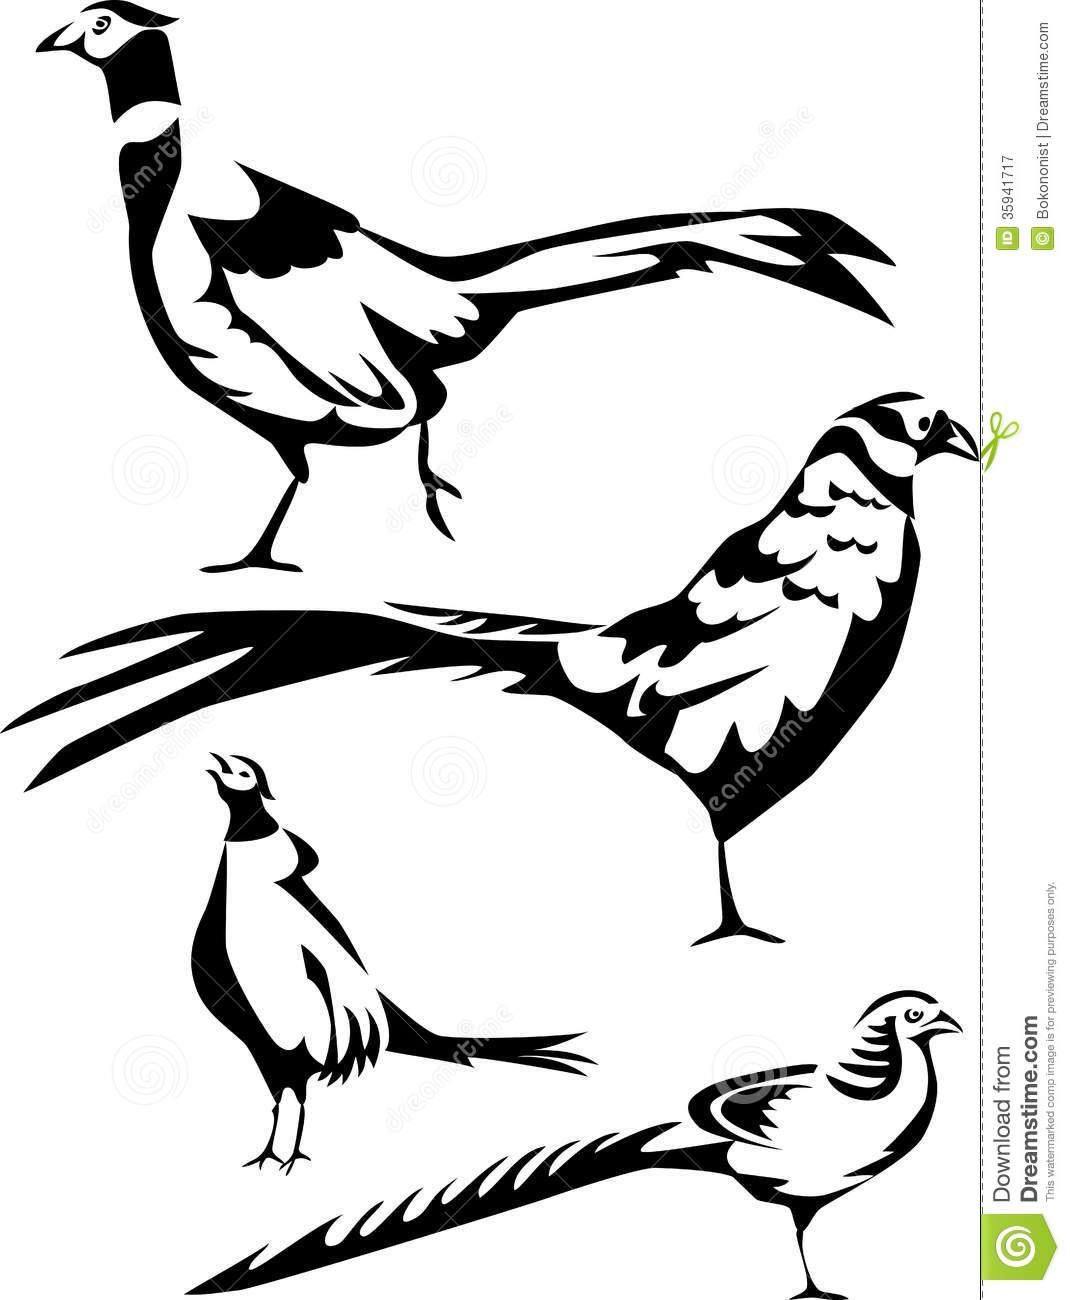 Pheasants Clip Art Line Drawings.